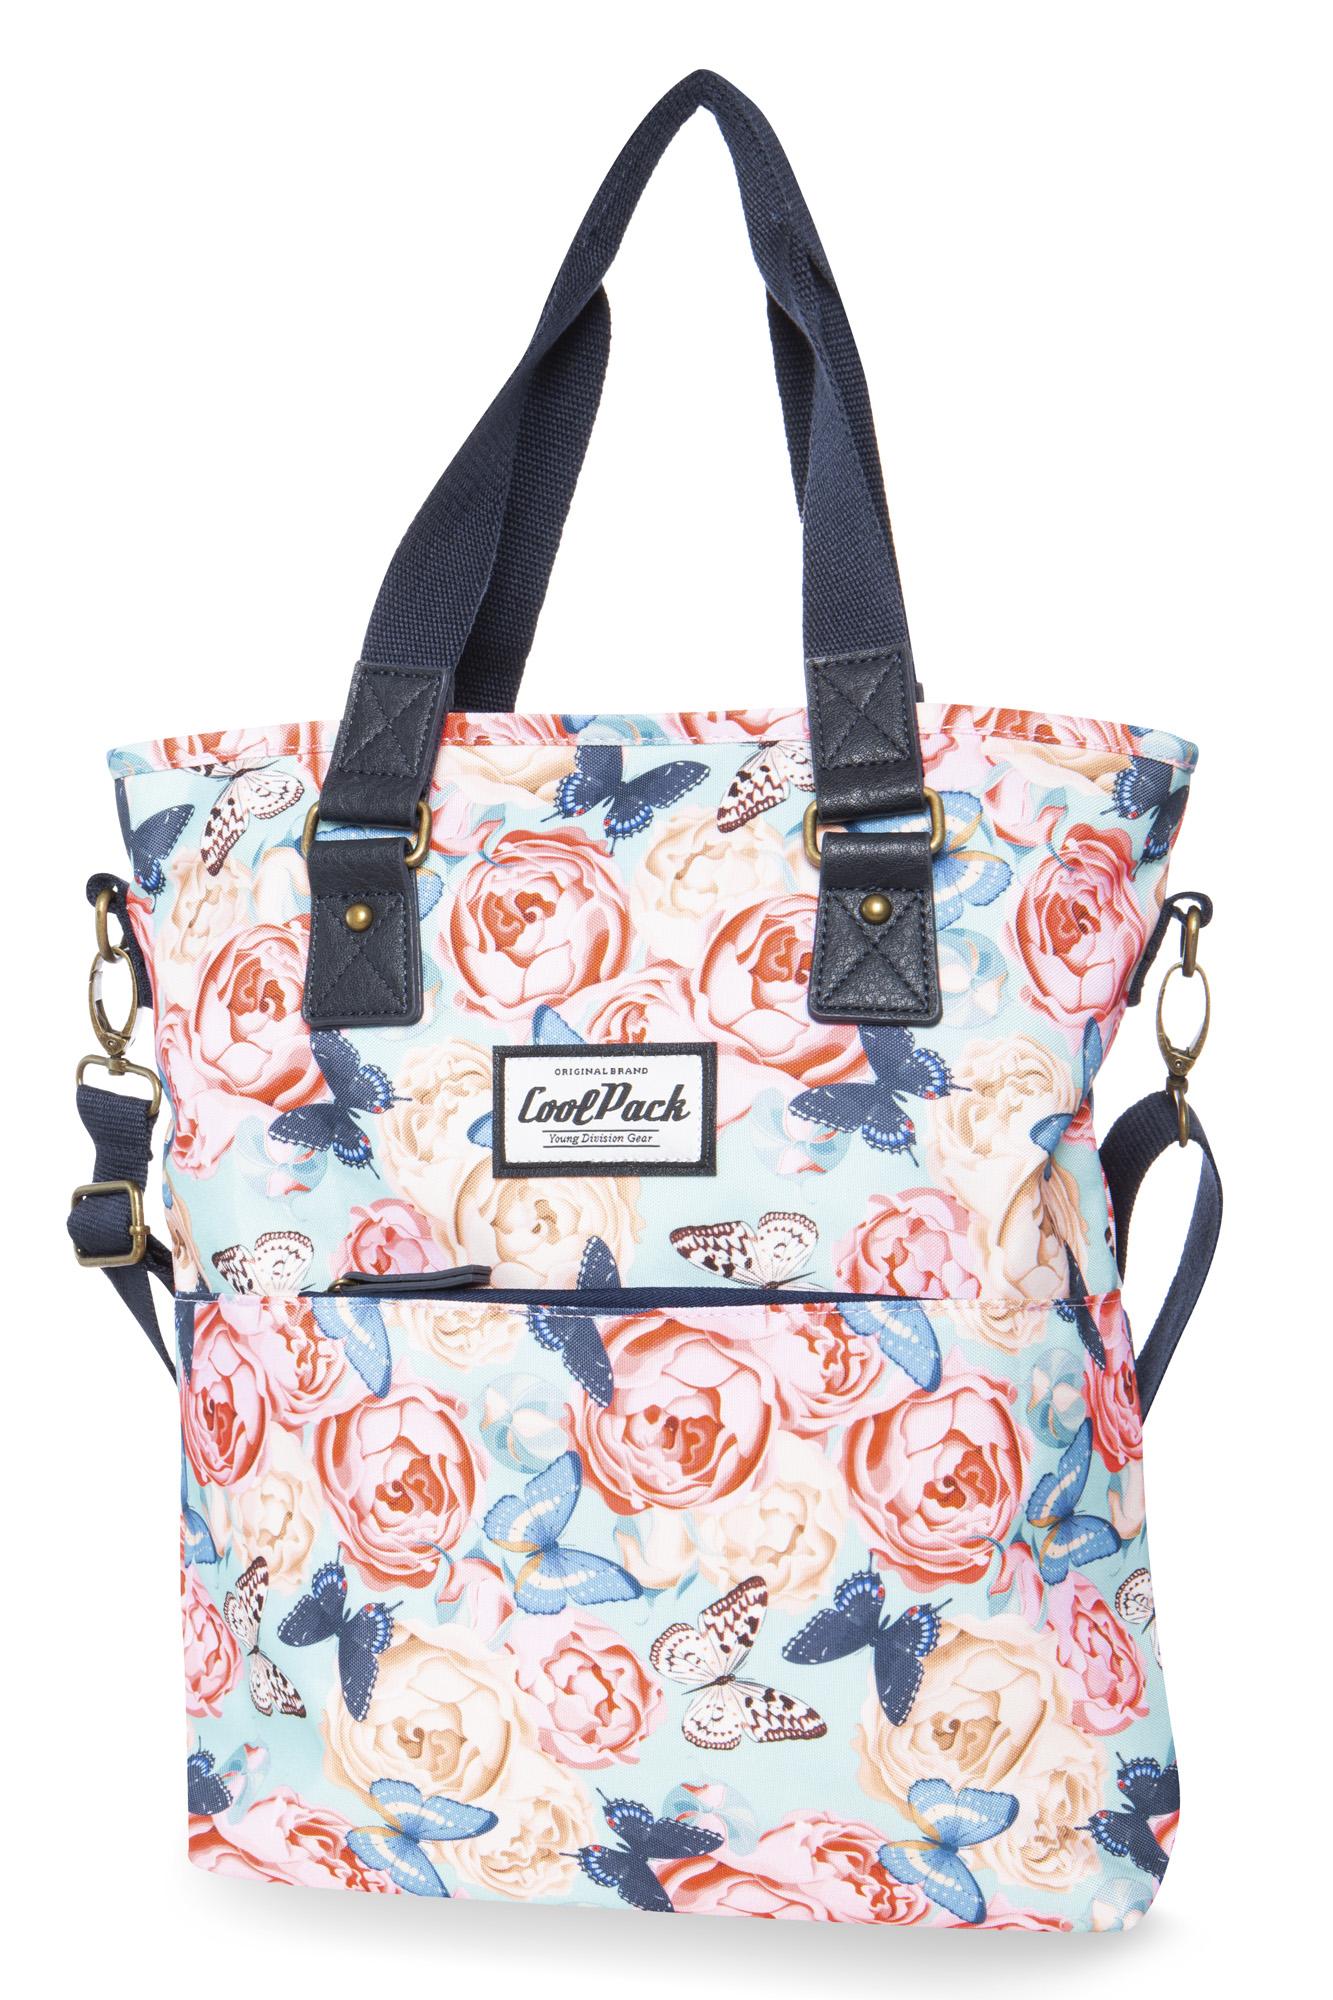 Coolpack - amber - shoulder bag - butterflies